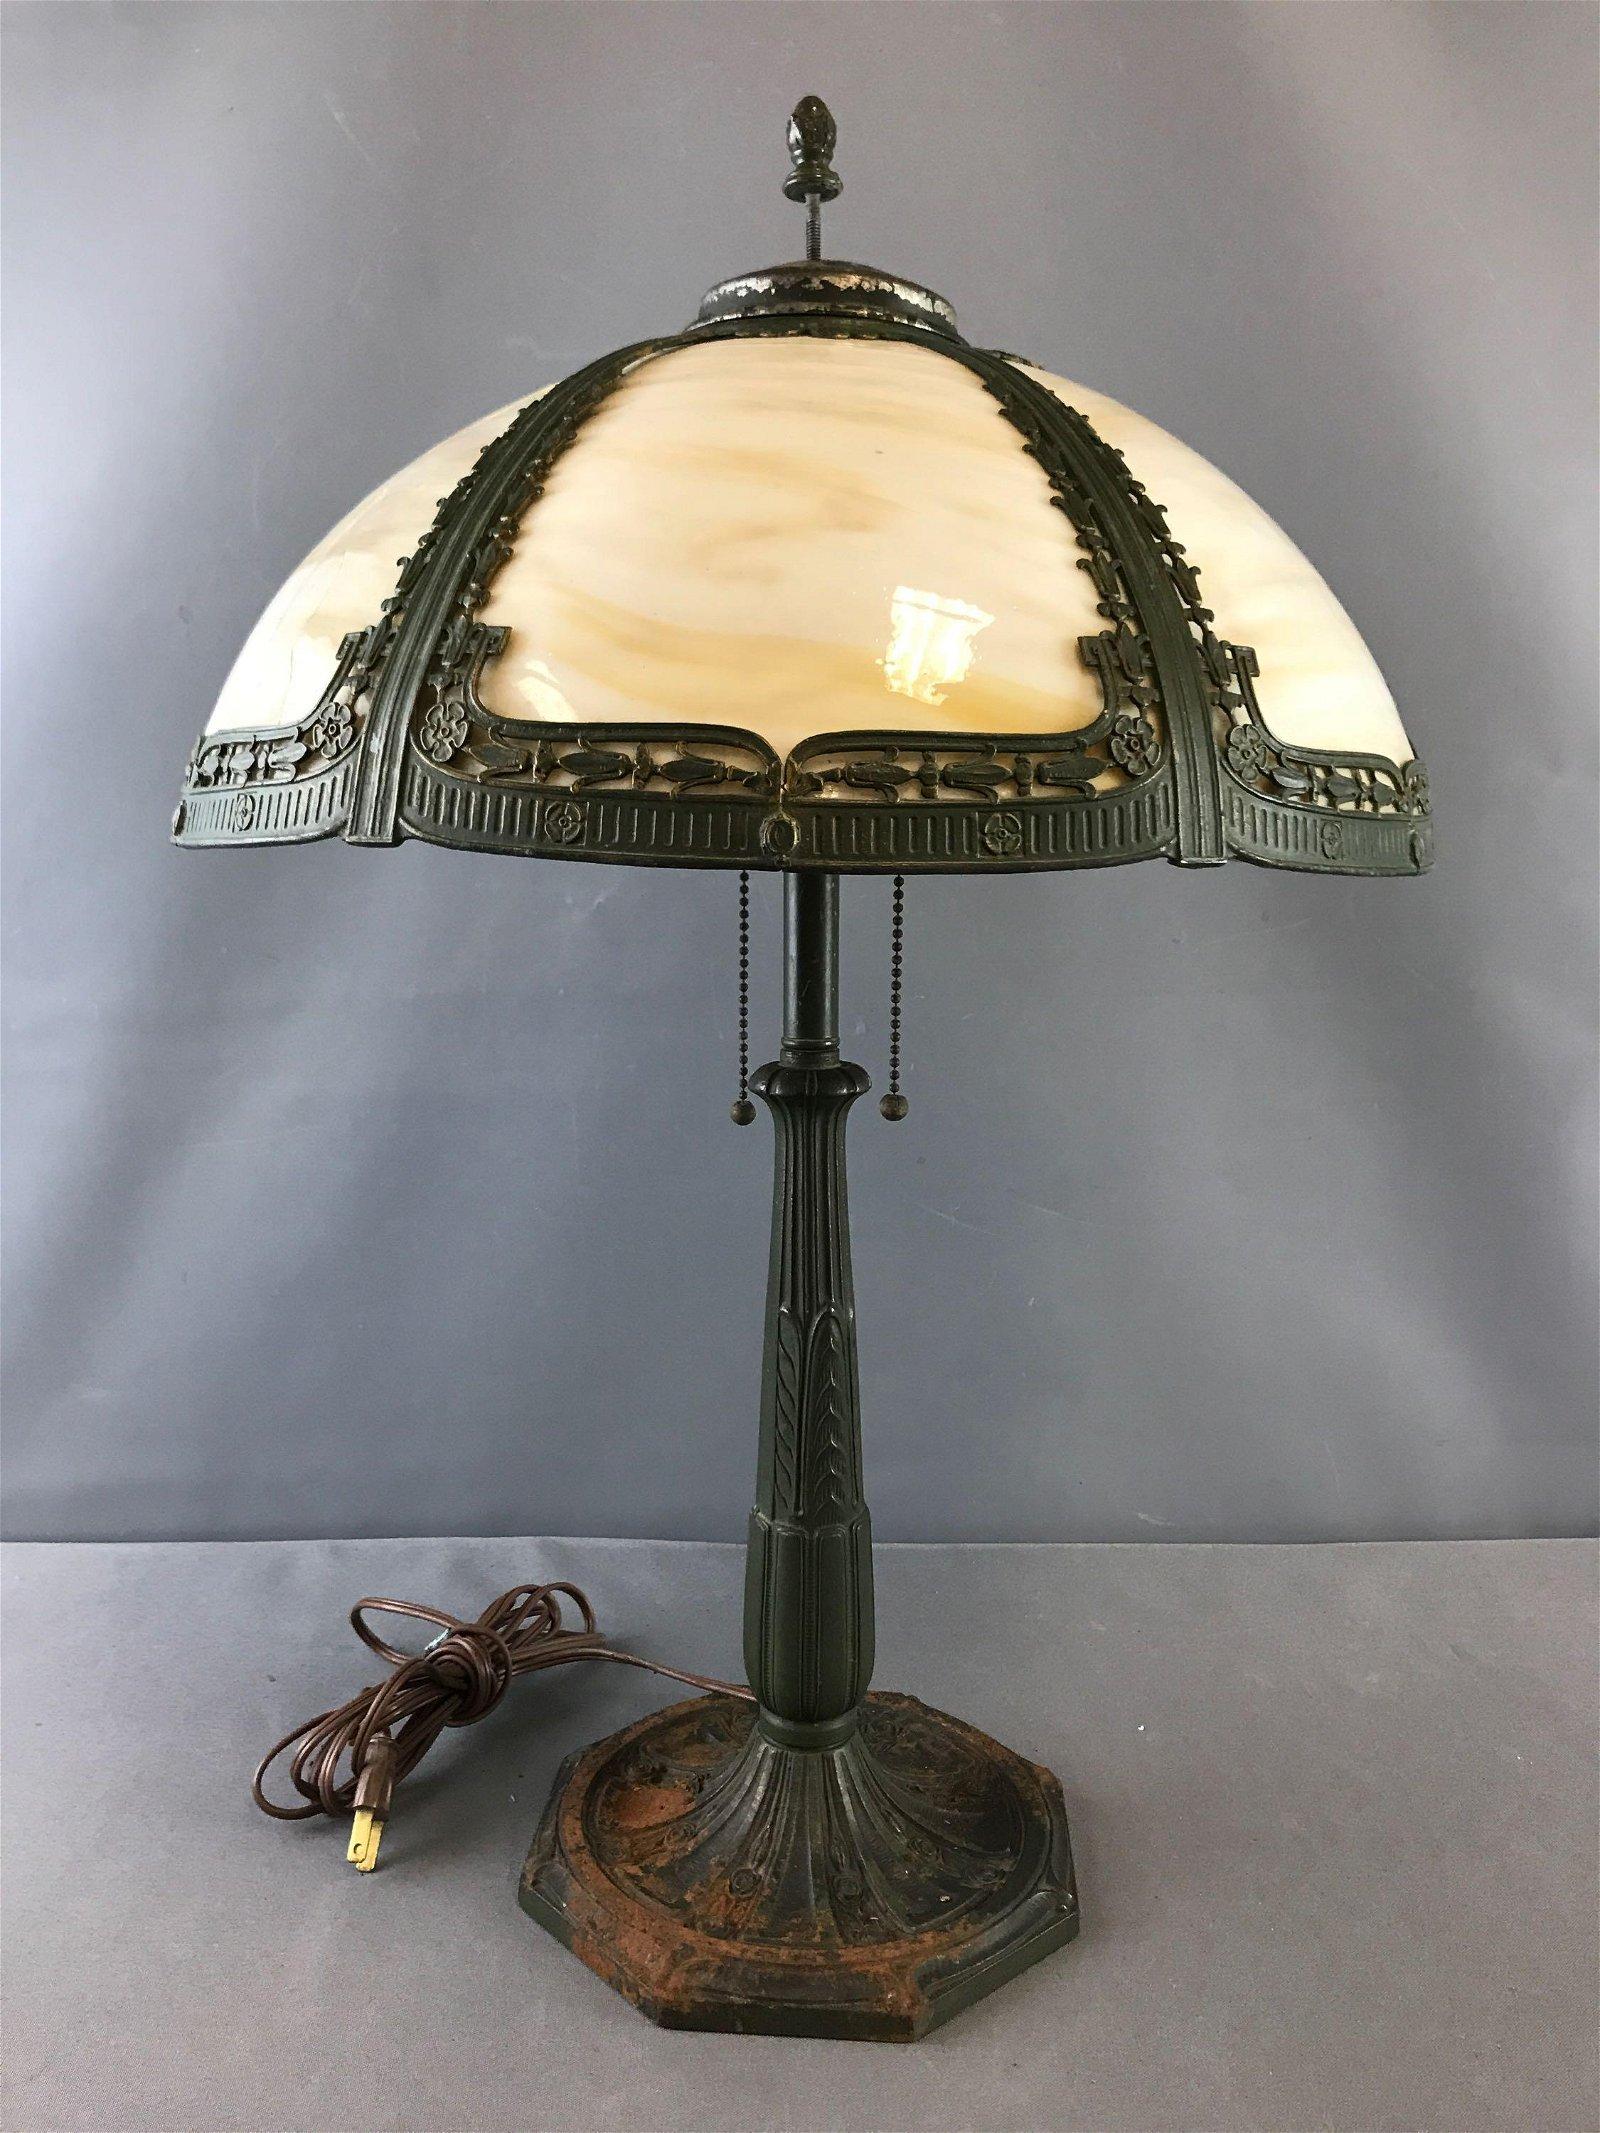 Antique Brass Table Lamp | Lighting